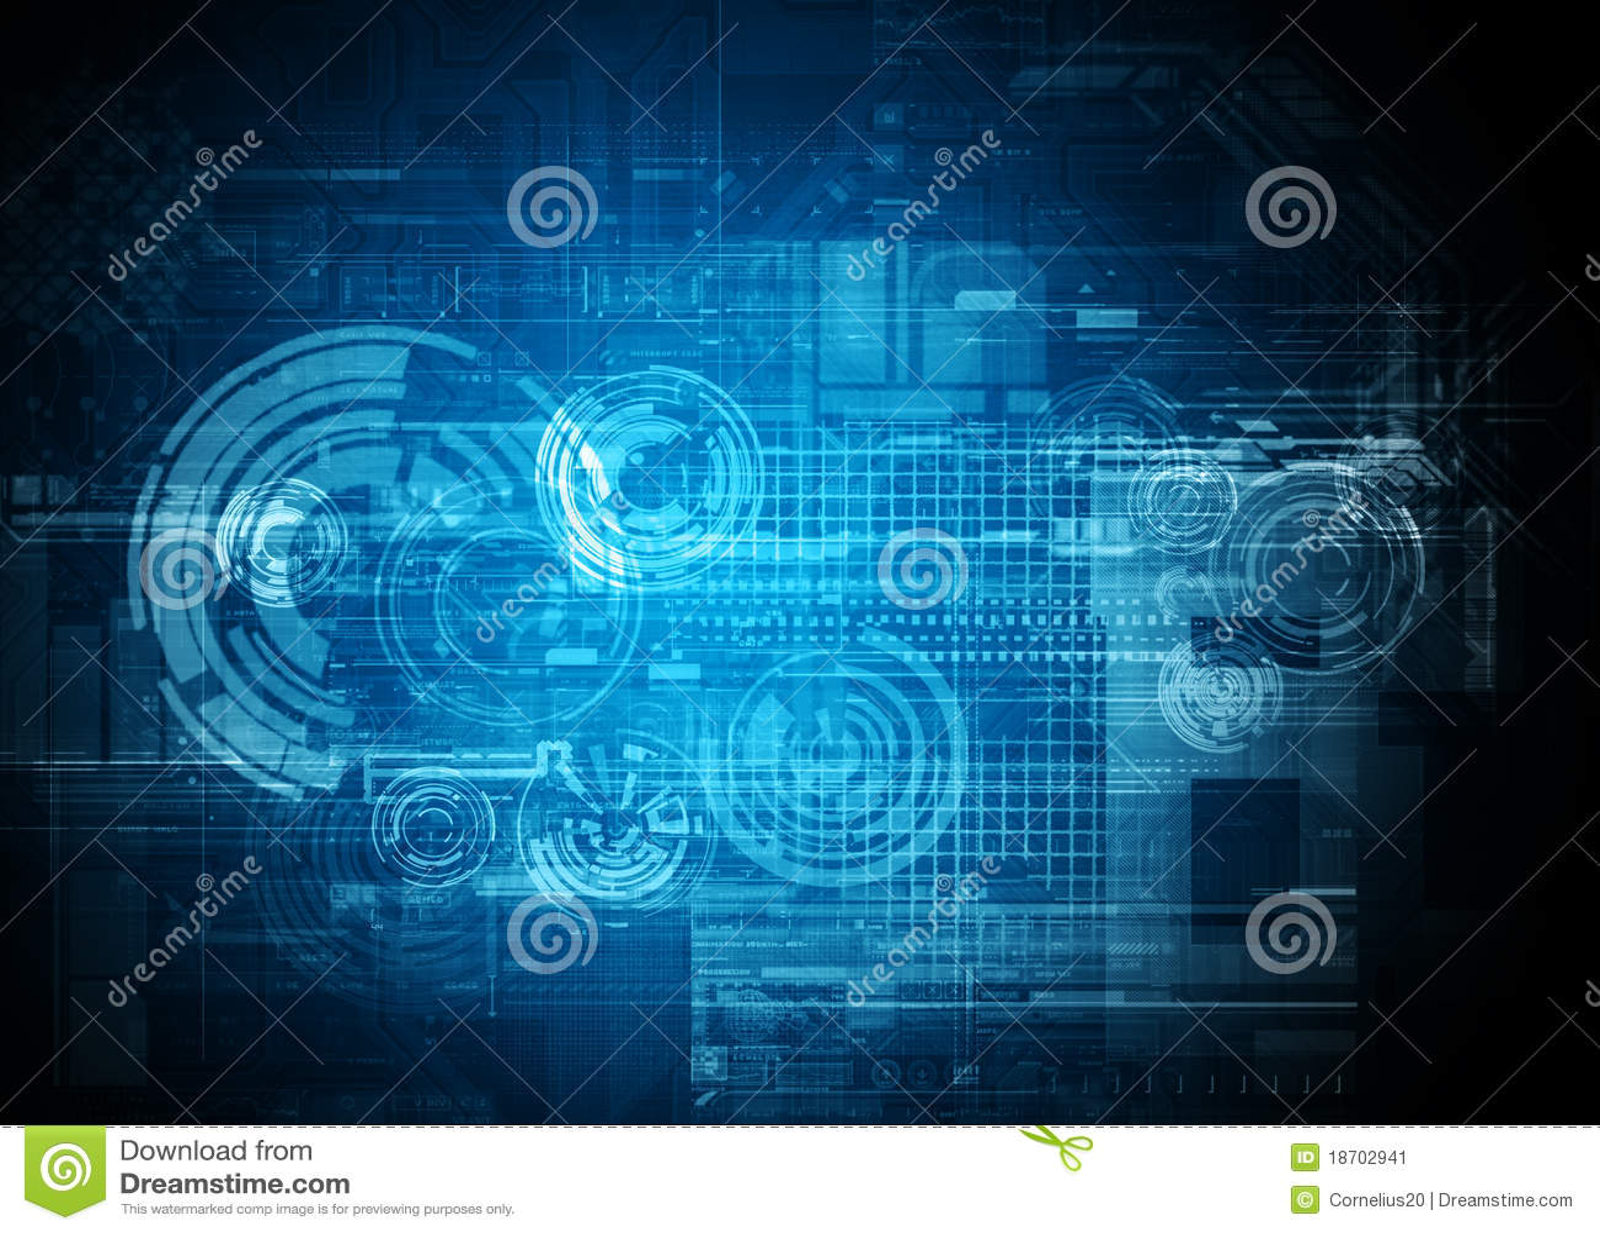 Abstract Tech Design Stock Illustration  Illustration Of Lights